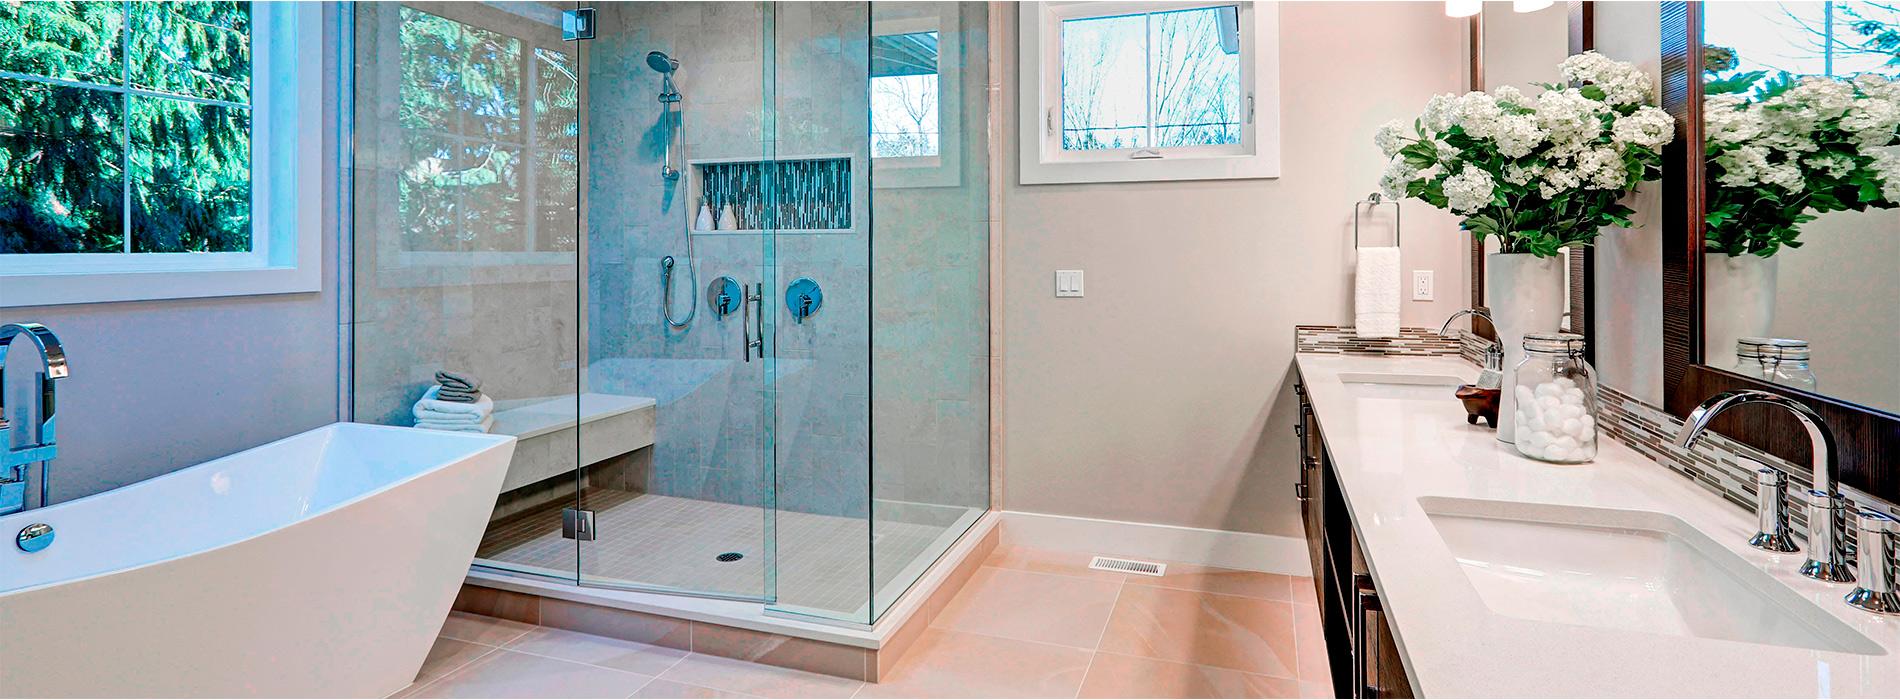 Estilo moderno de cuarto de baño